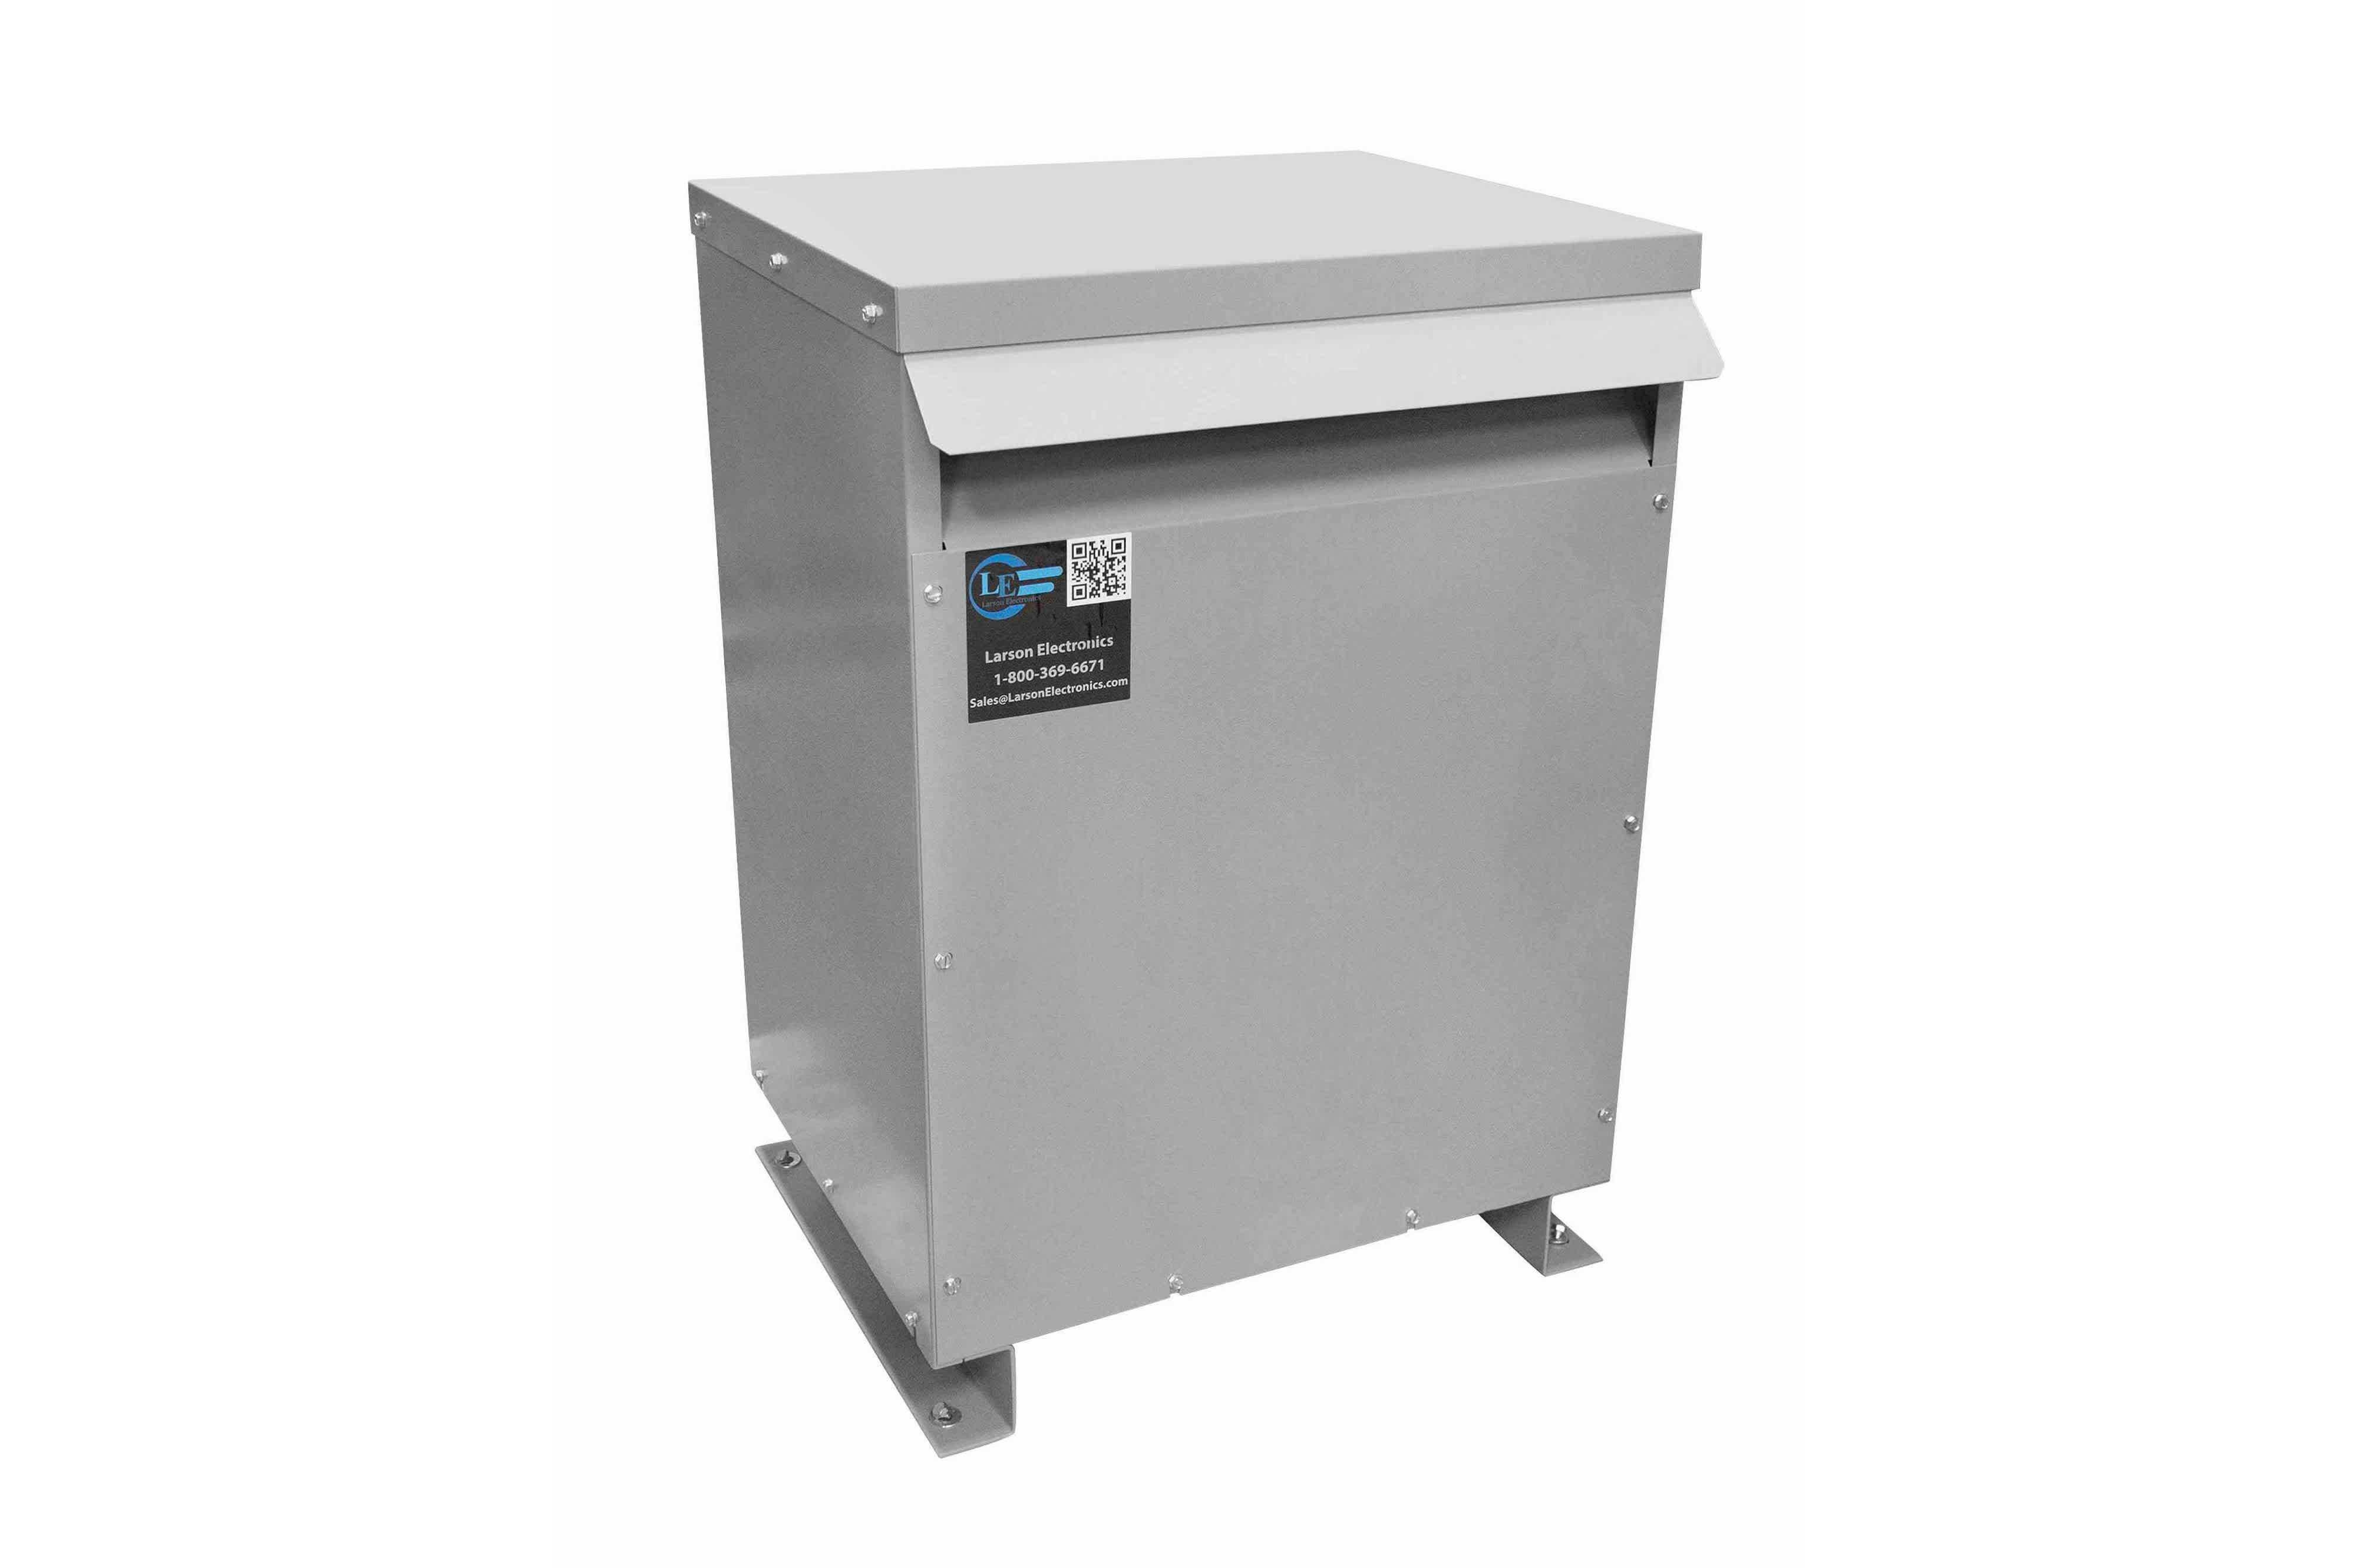 37.5 kVA 3PH Isolation Transformer, 208V Wye Primary, 400Y/231 Wye-N Secondary, N3R, Ventilated, 60 Hz